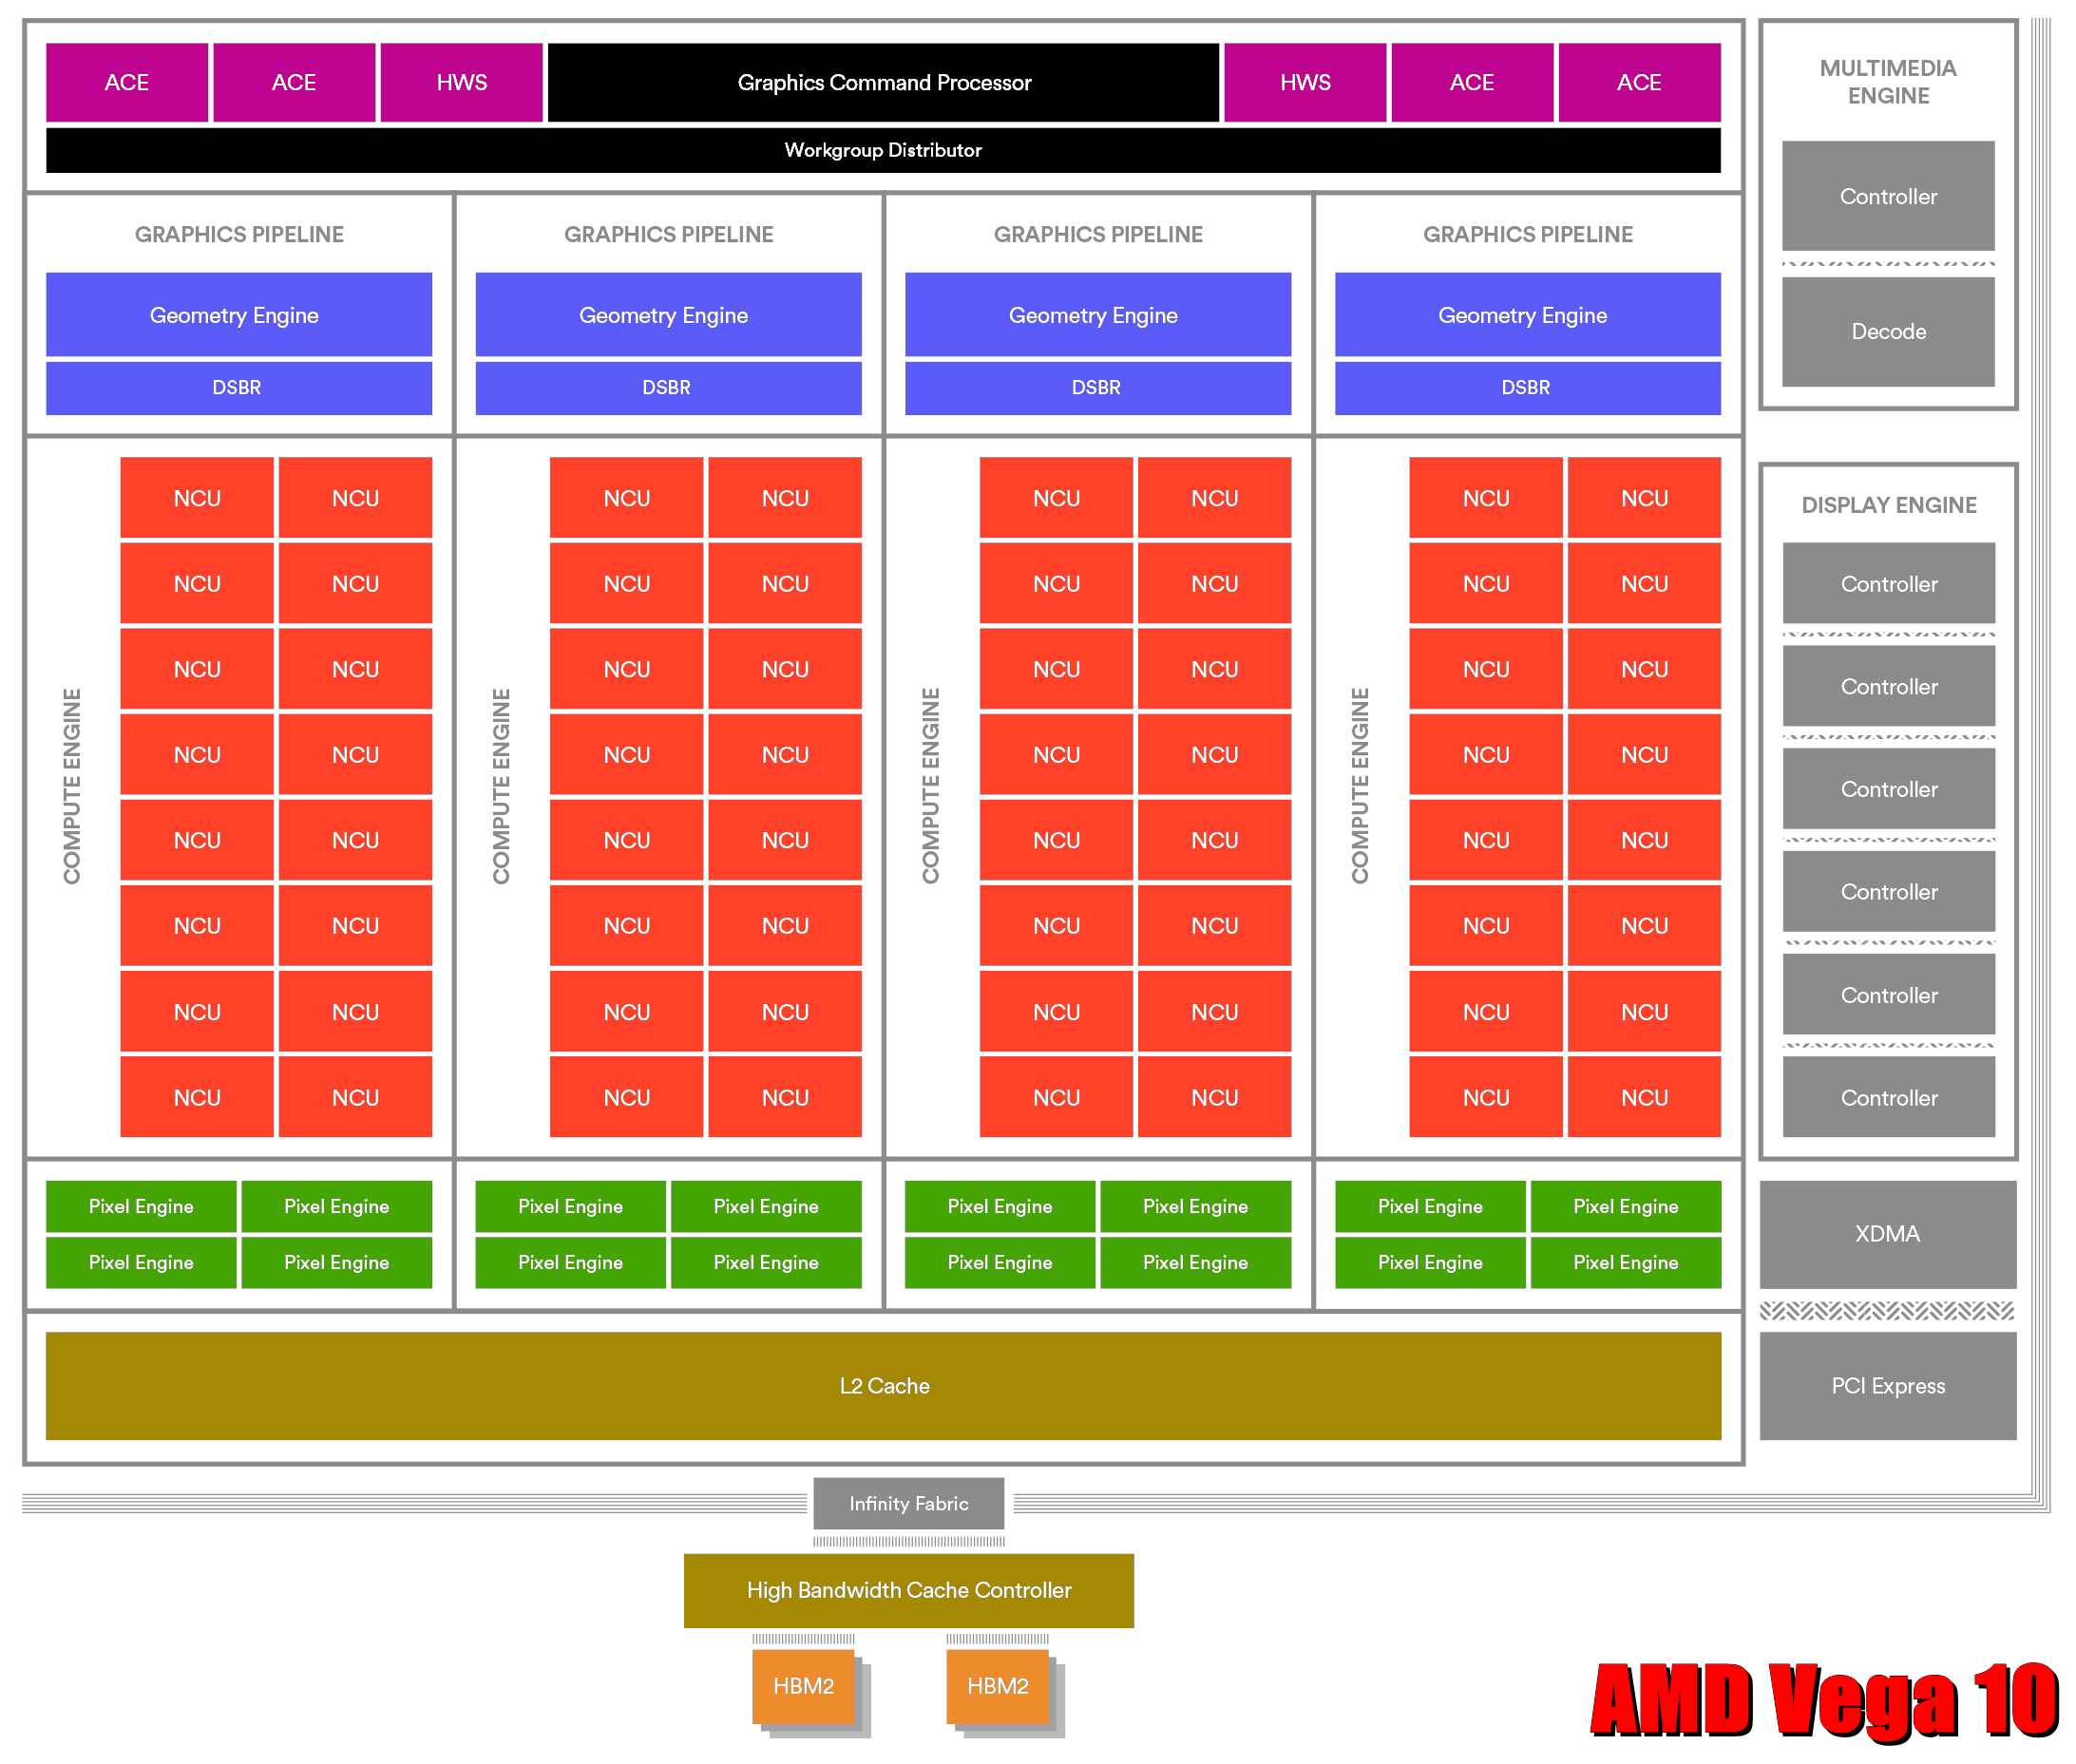 Launch-Analyse AMD Radeon RX Vega | 3DCenter.org